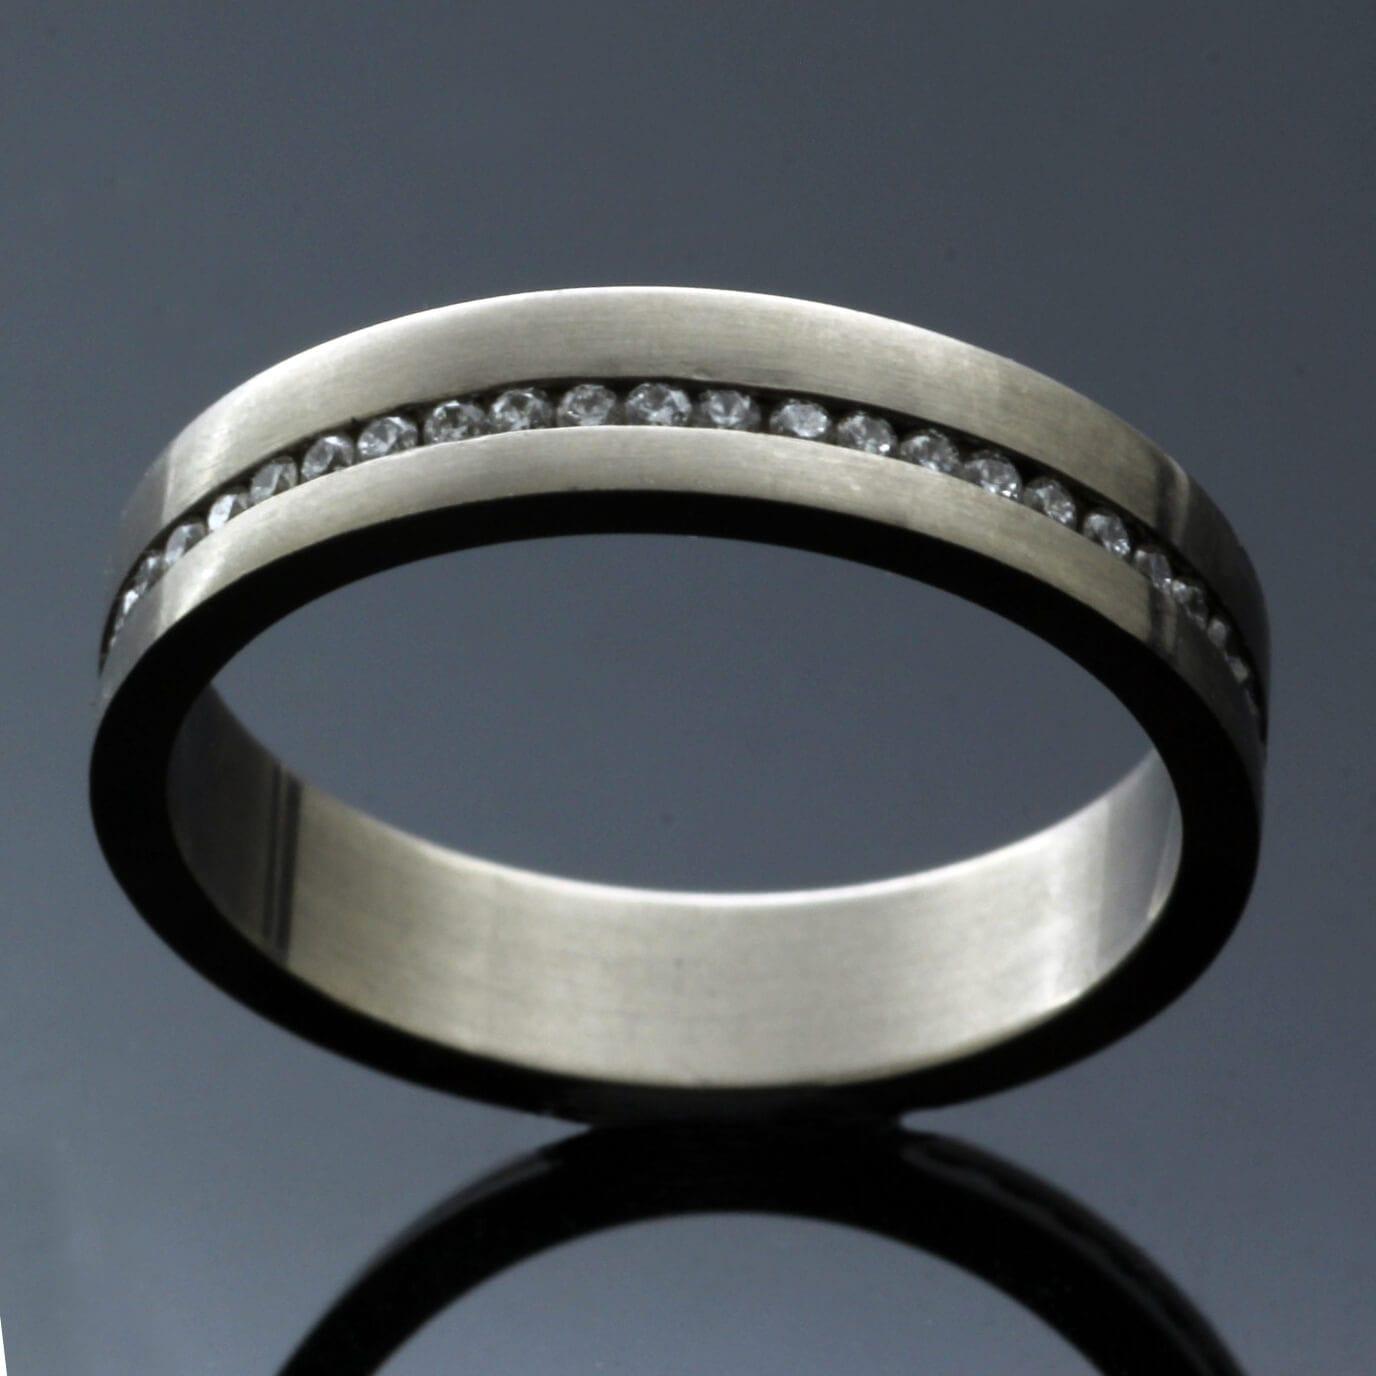 Contemporary handcrafted white gold diamond eternity band unique design